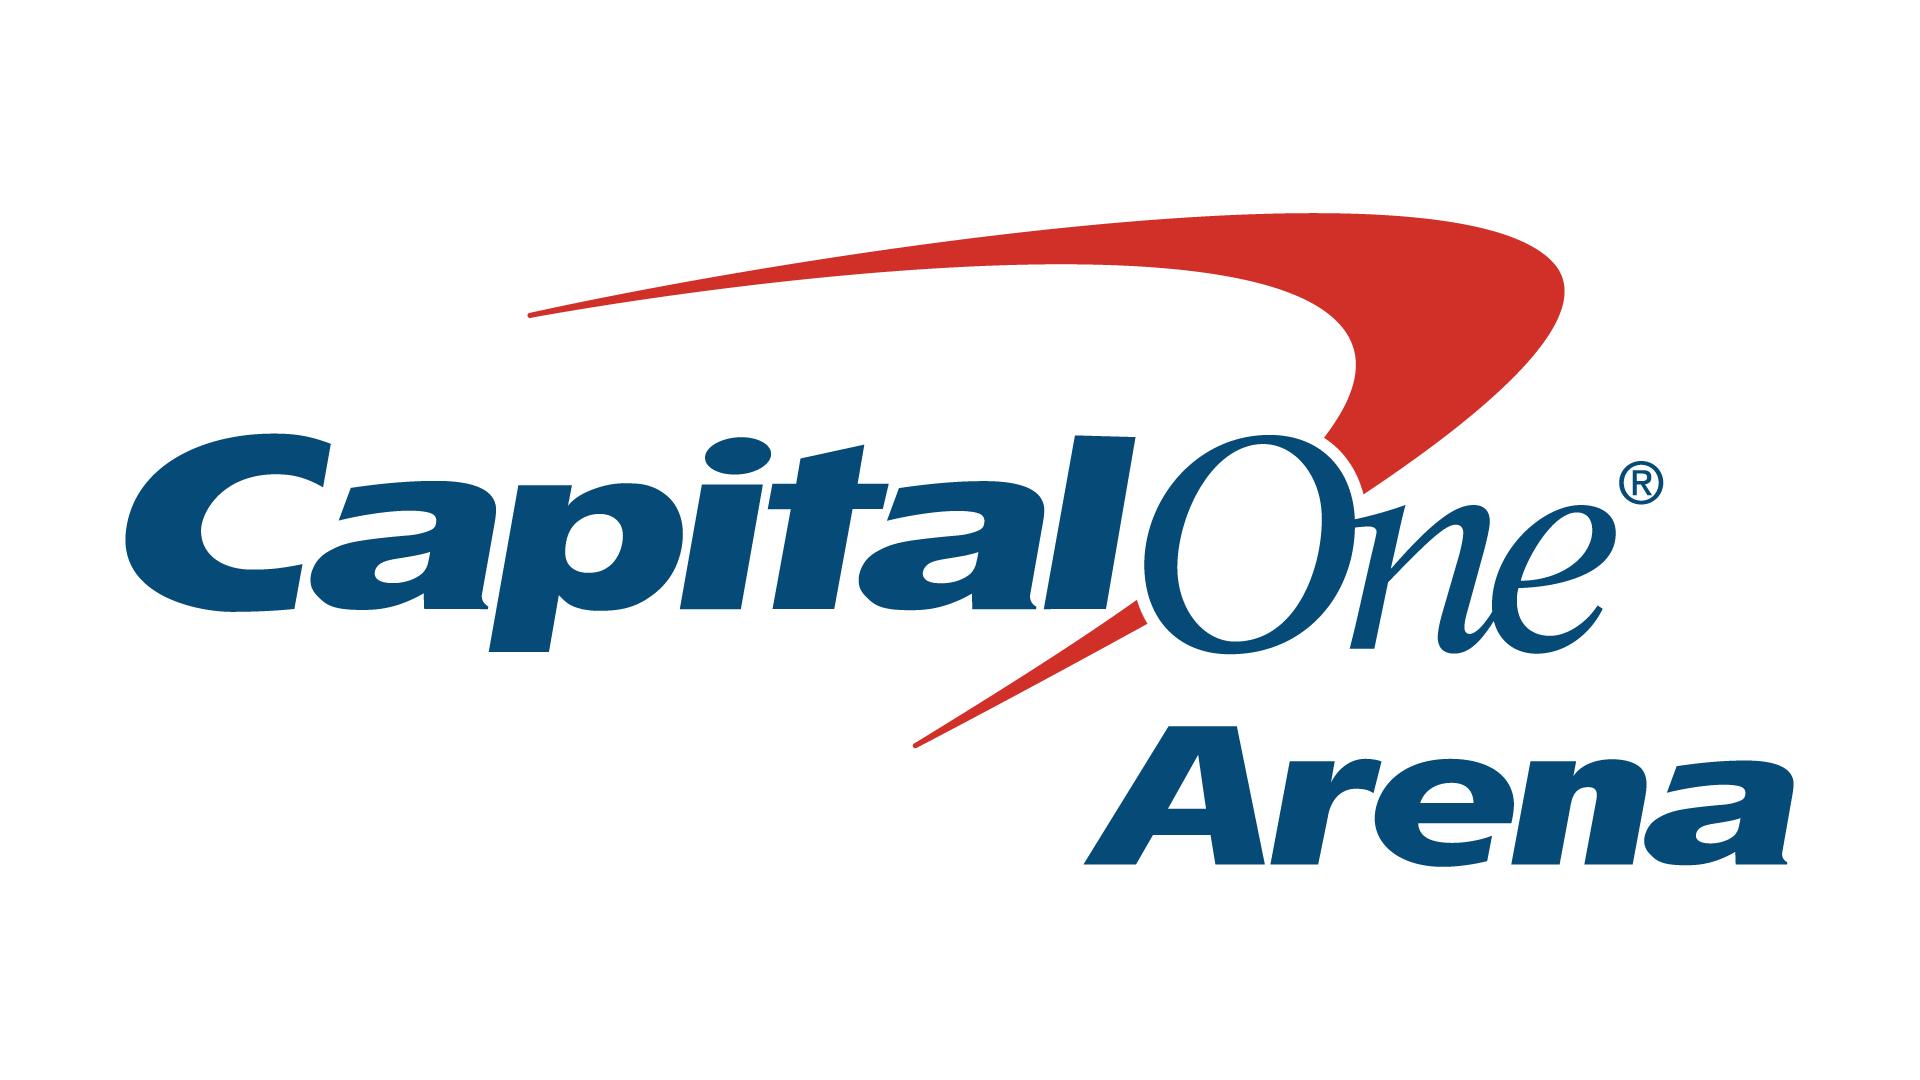 D.C.'s Verizon Center becomes Capital One Arena